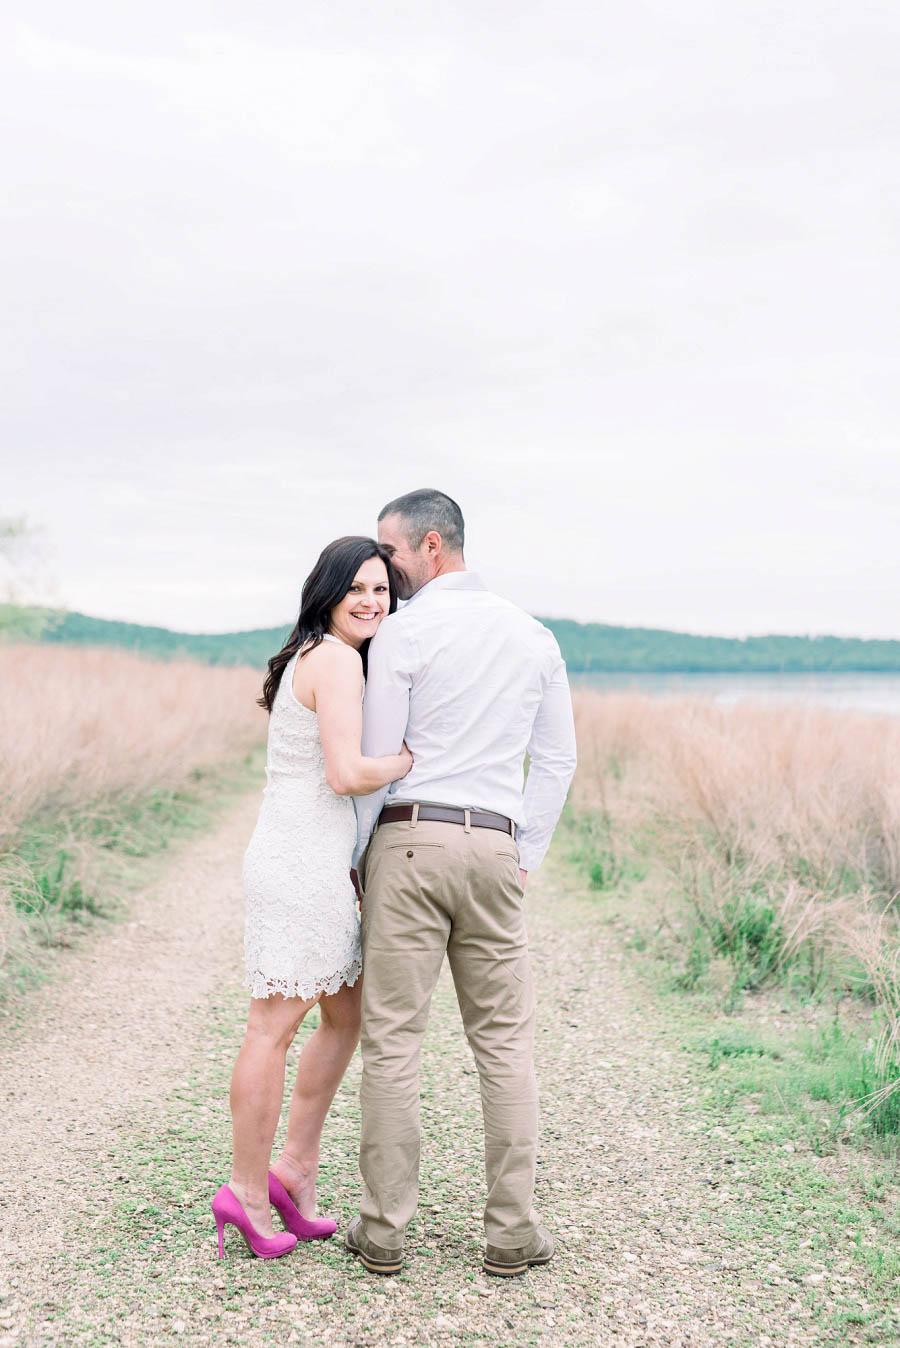 Spring Engagement - NJ Wedding Photographer - Myra Roman Photography-25.jpg